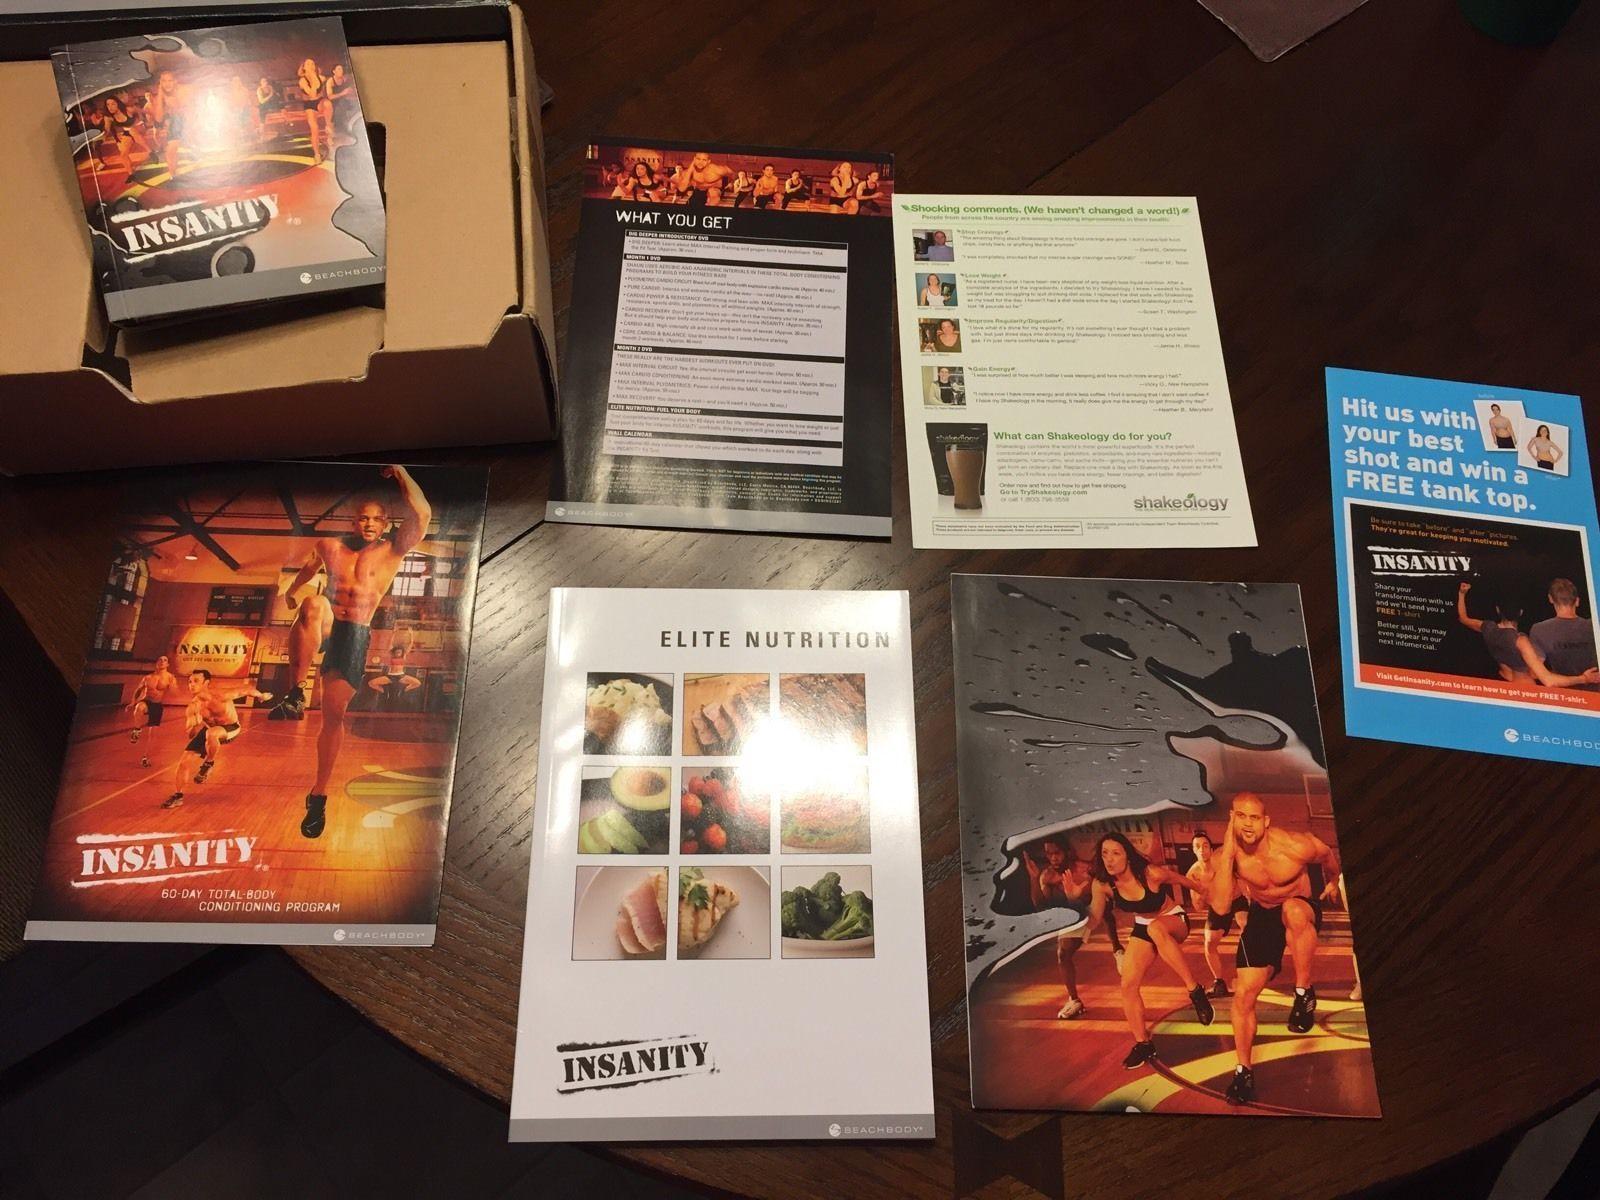 Insanity 60 Day Workout 13 dvd - DVD, HD DVD & Blu-ray